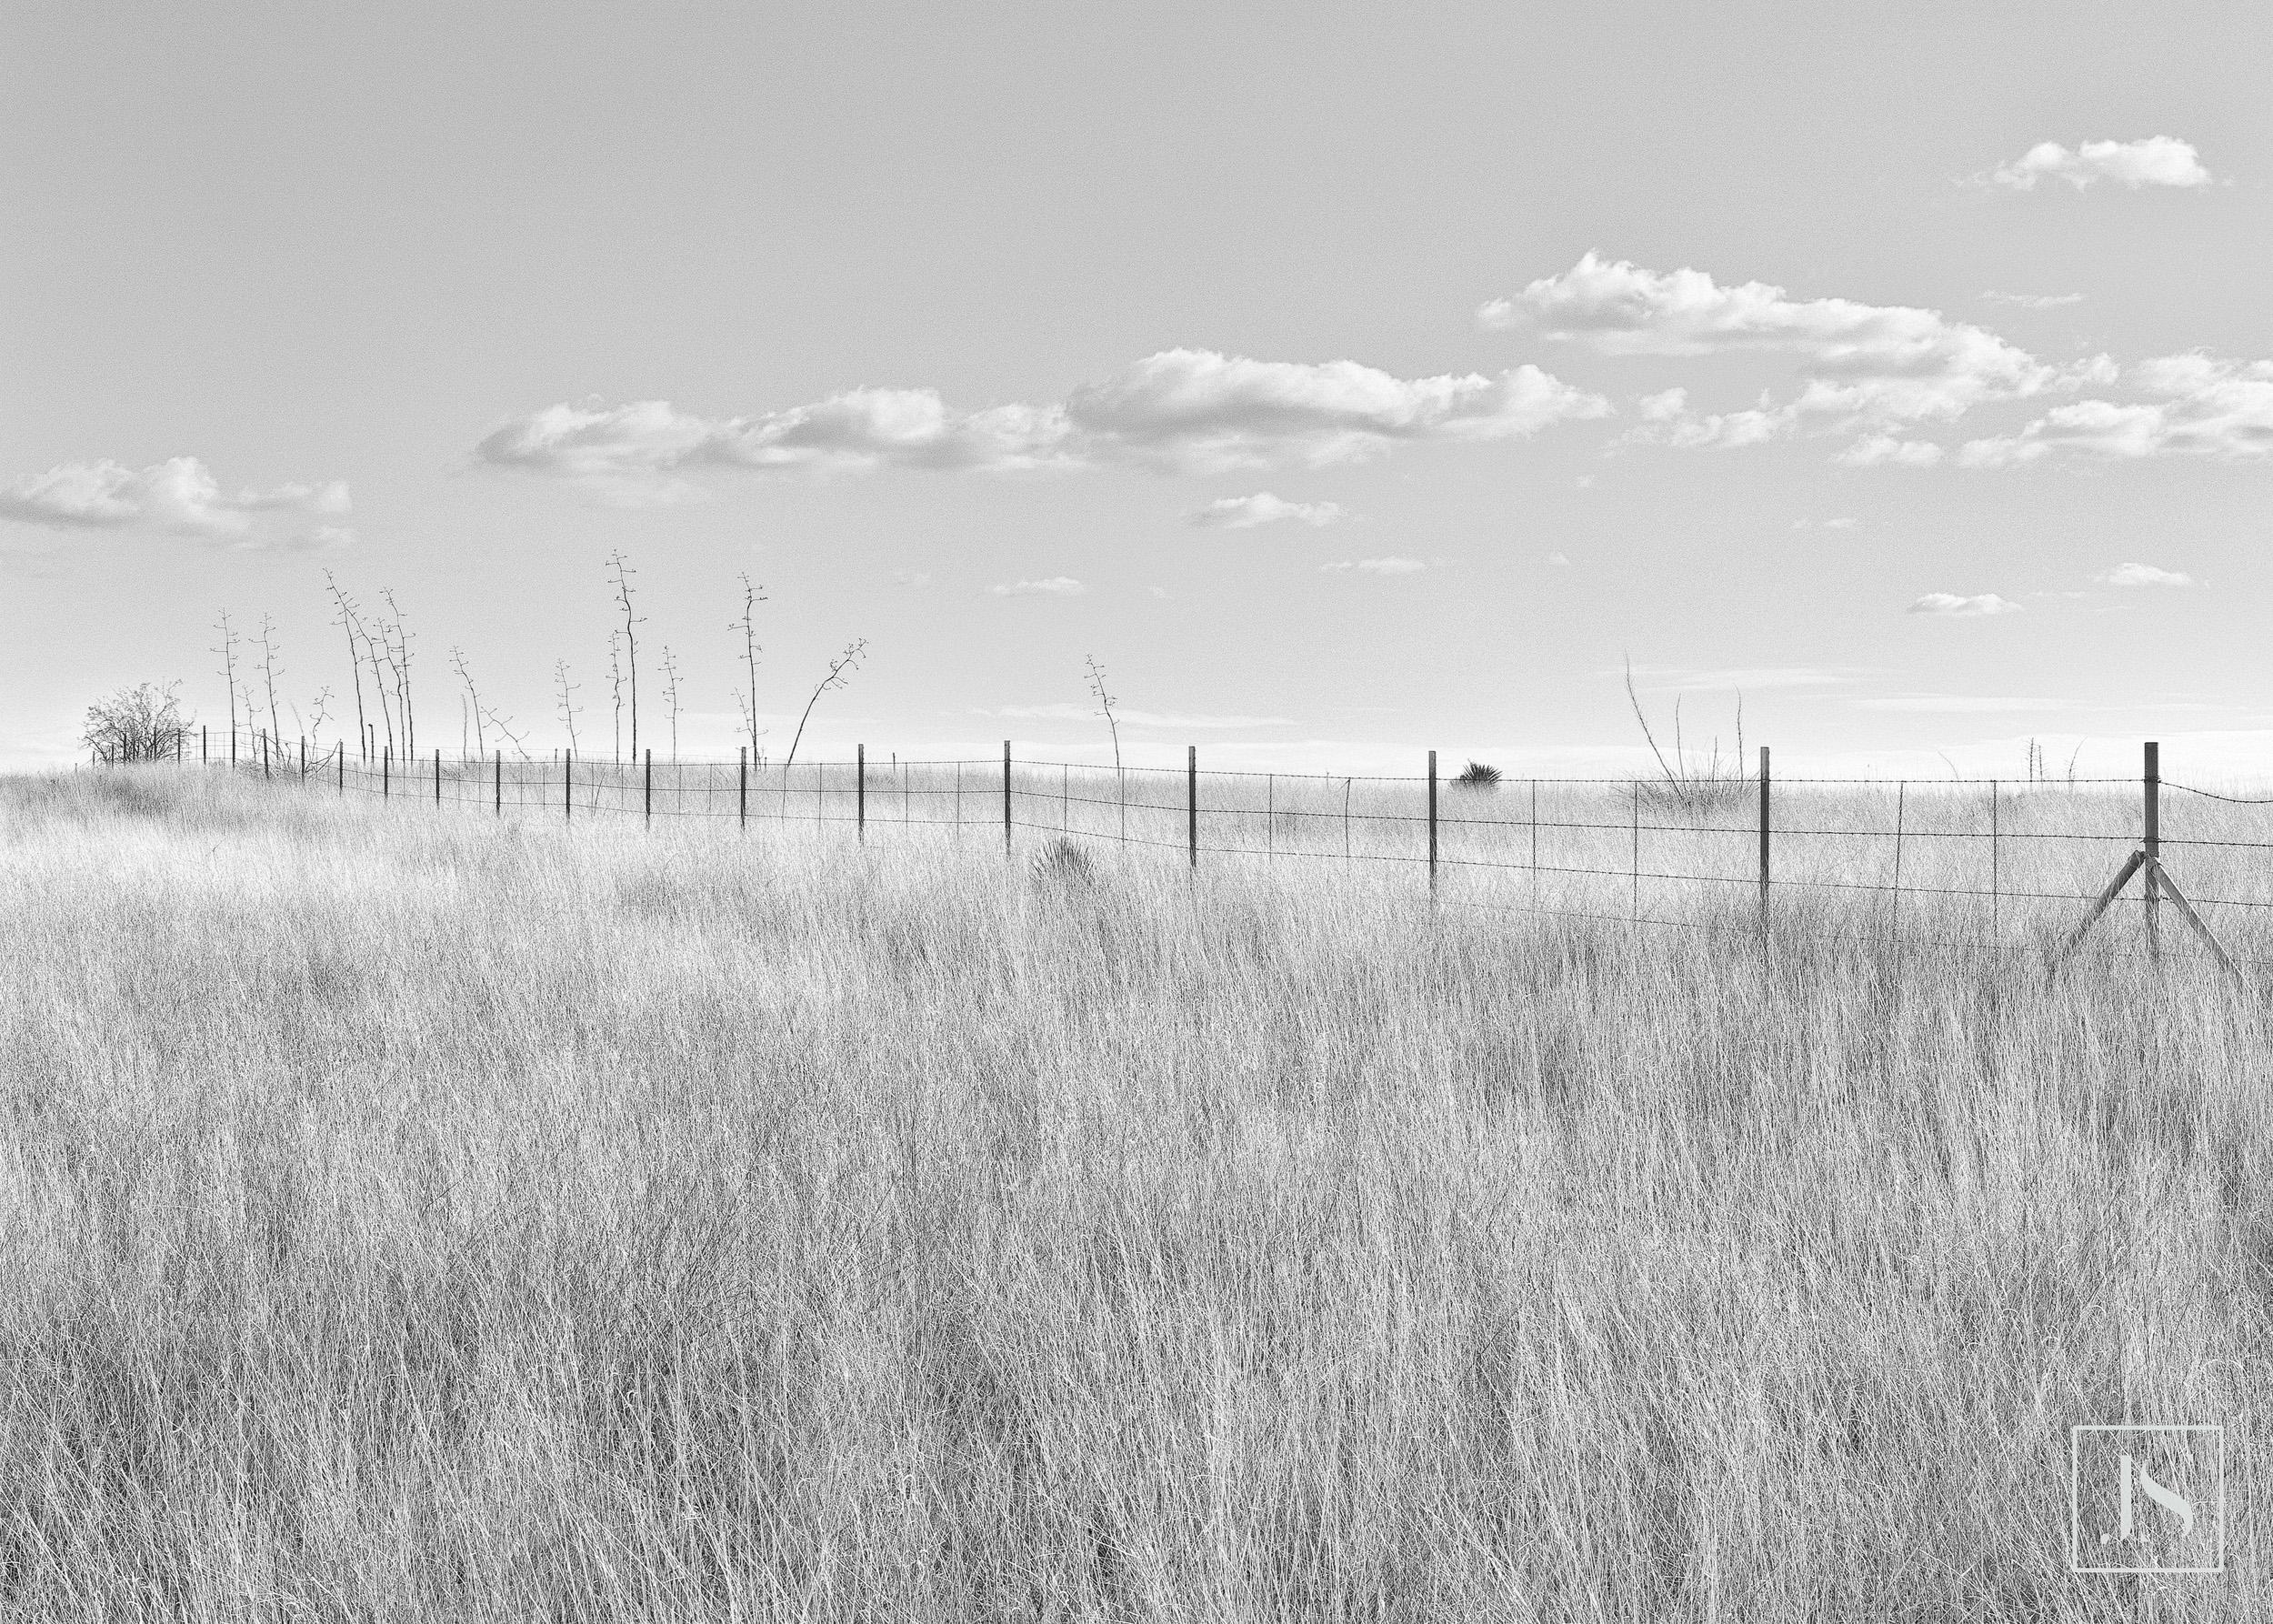 Fence Line-Sonoita, AZ 2000